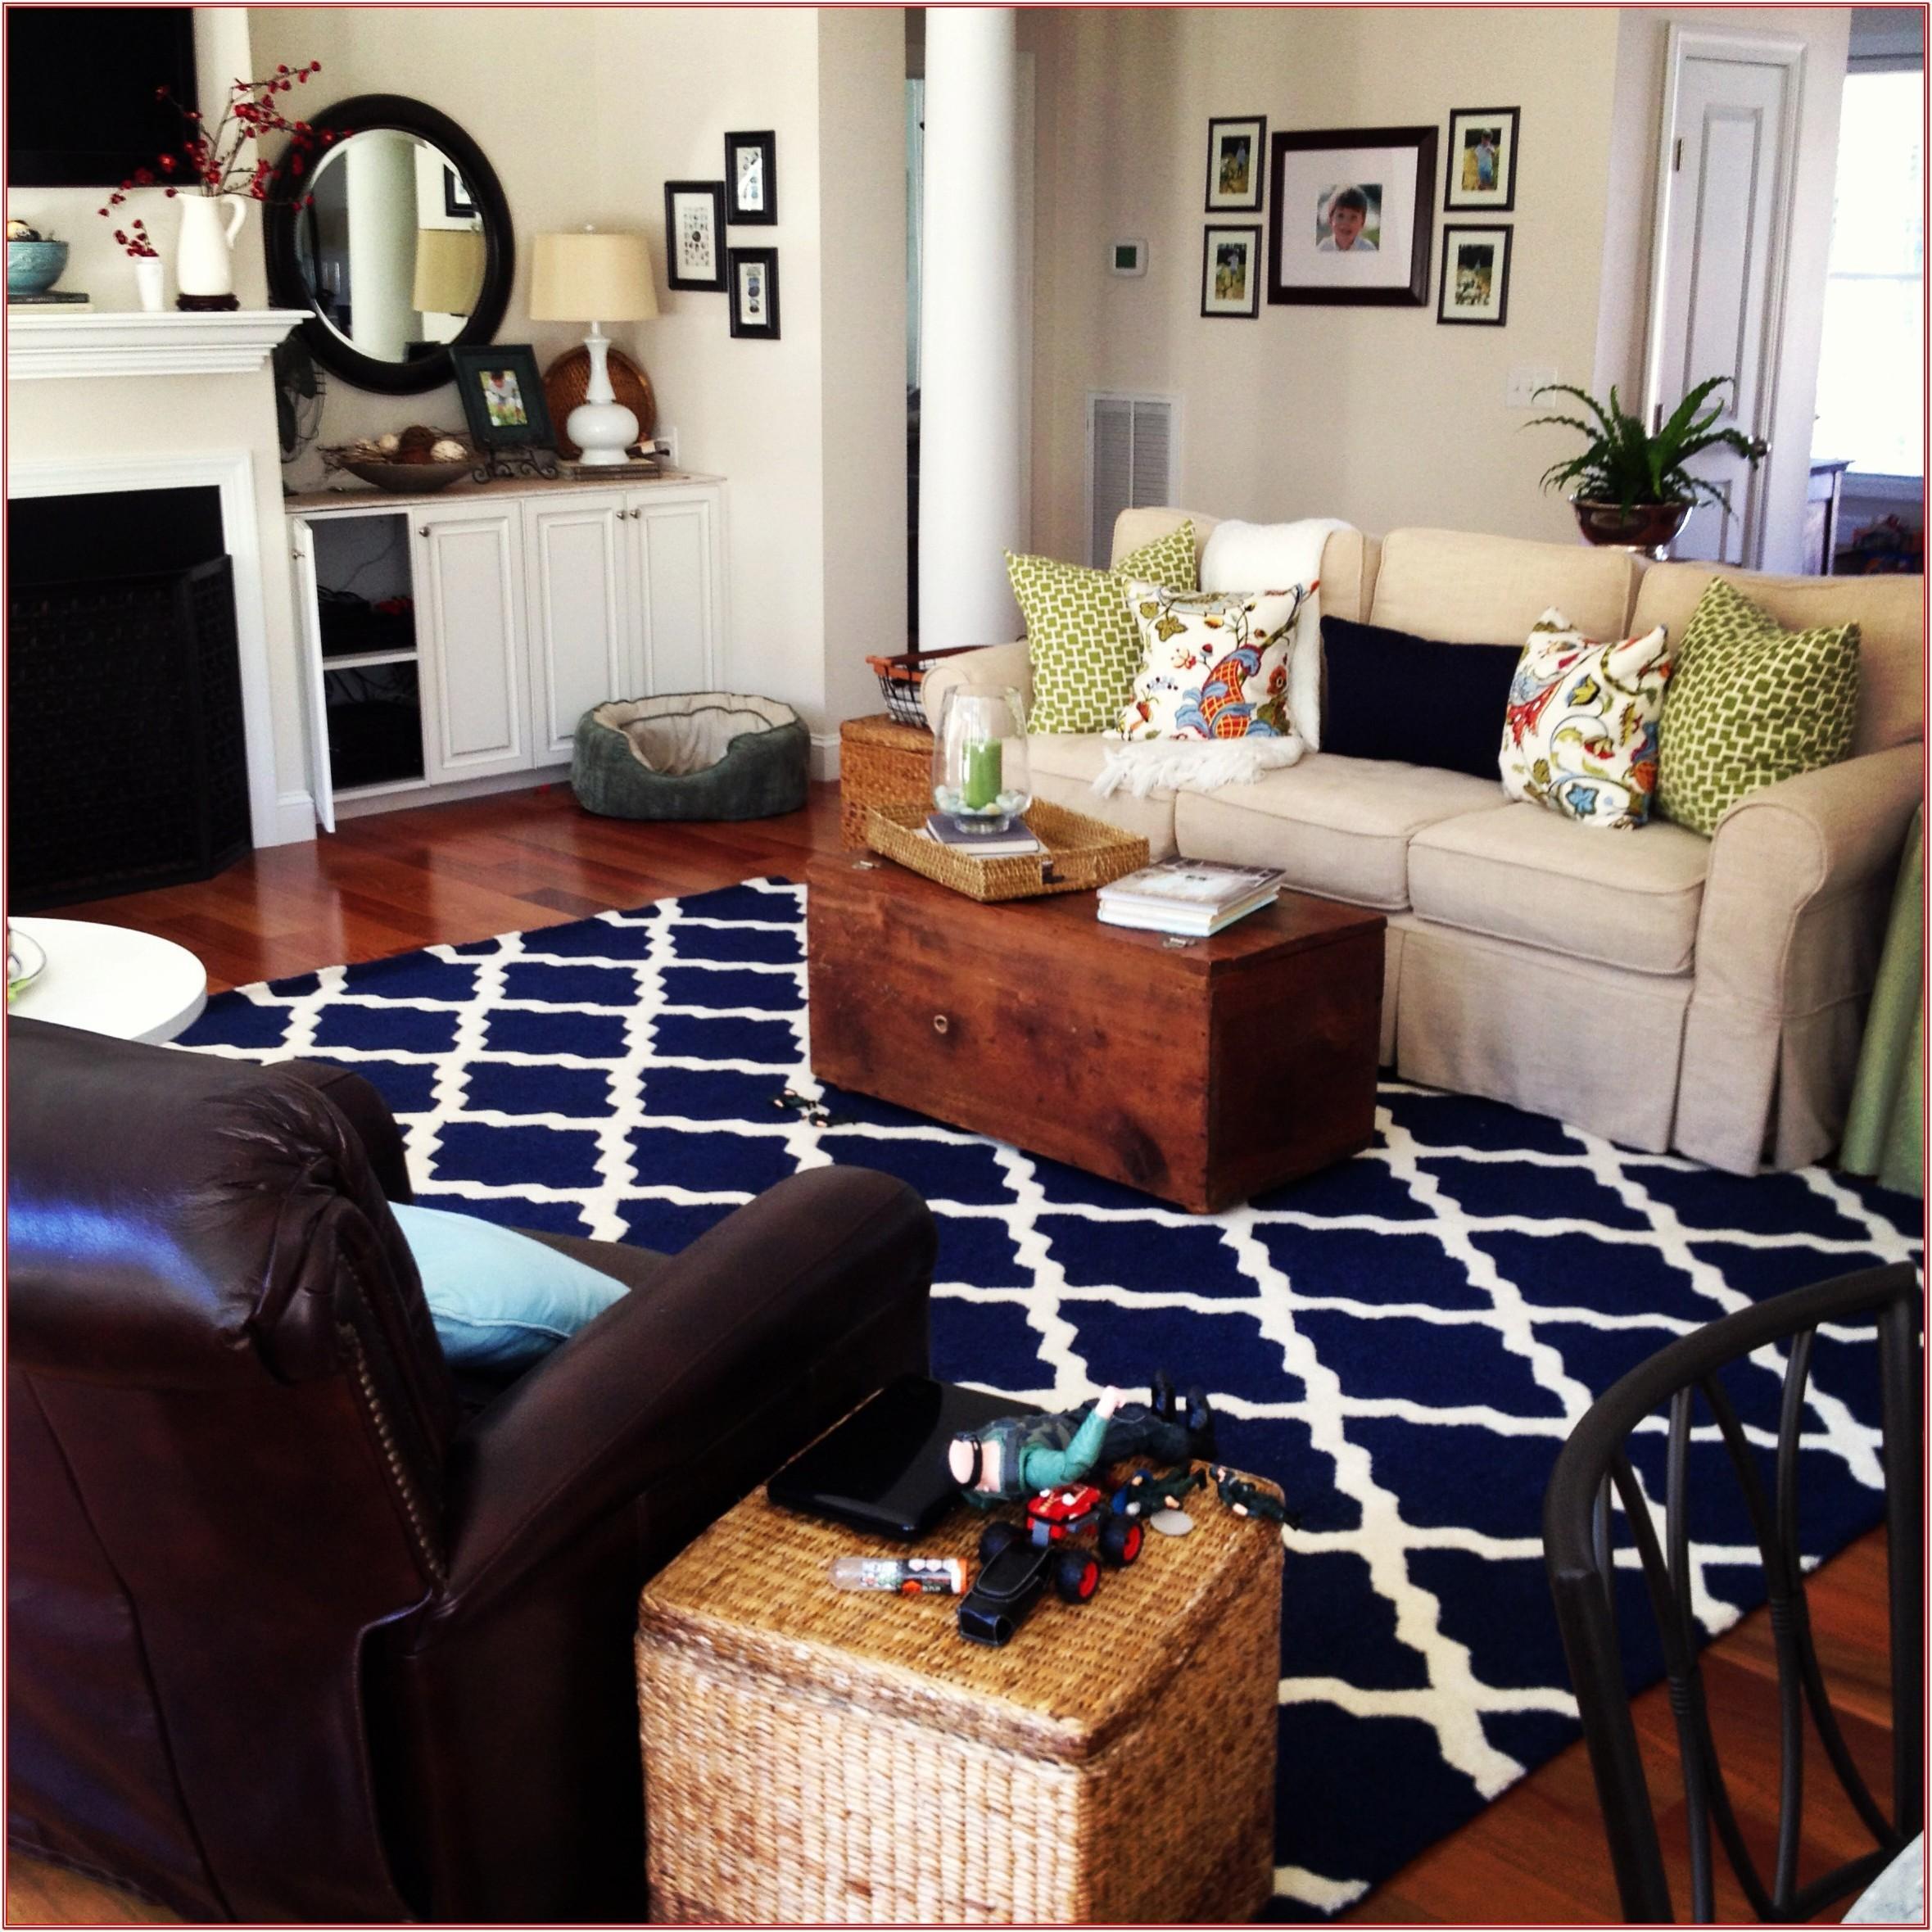 5 X 7 Rug In Living Room